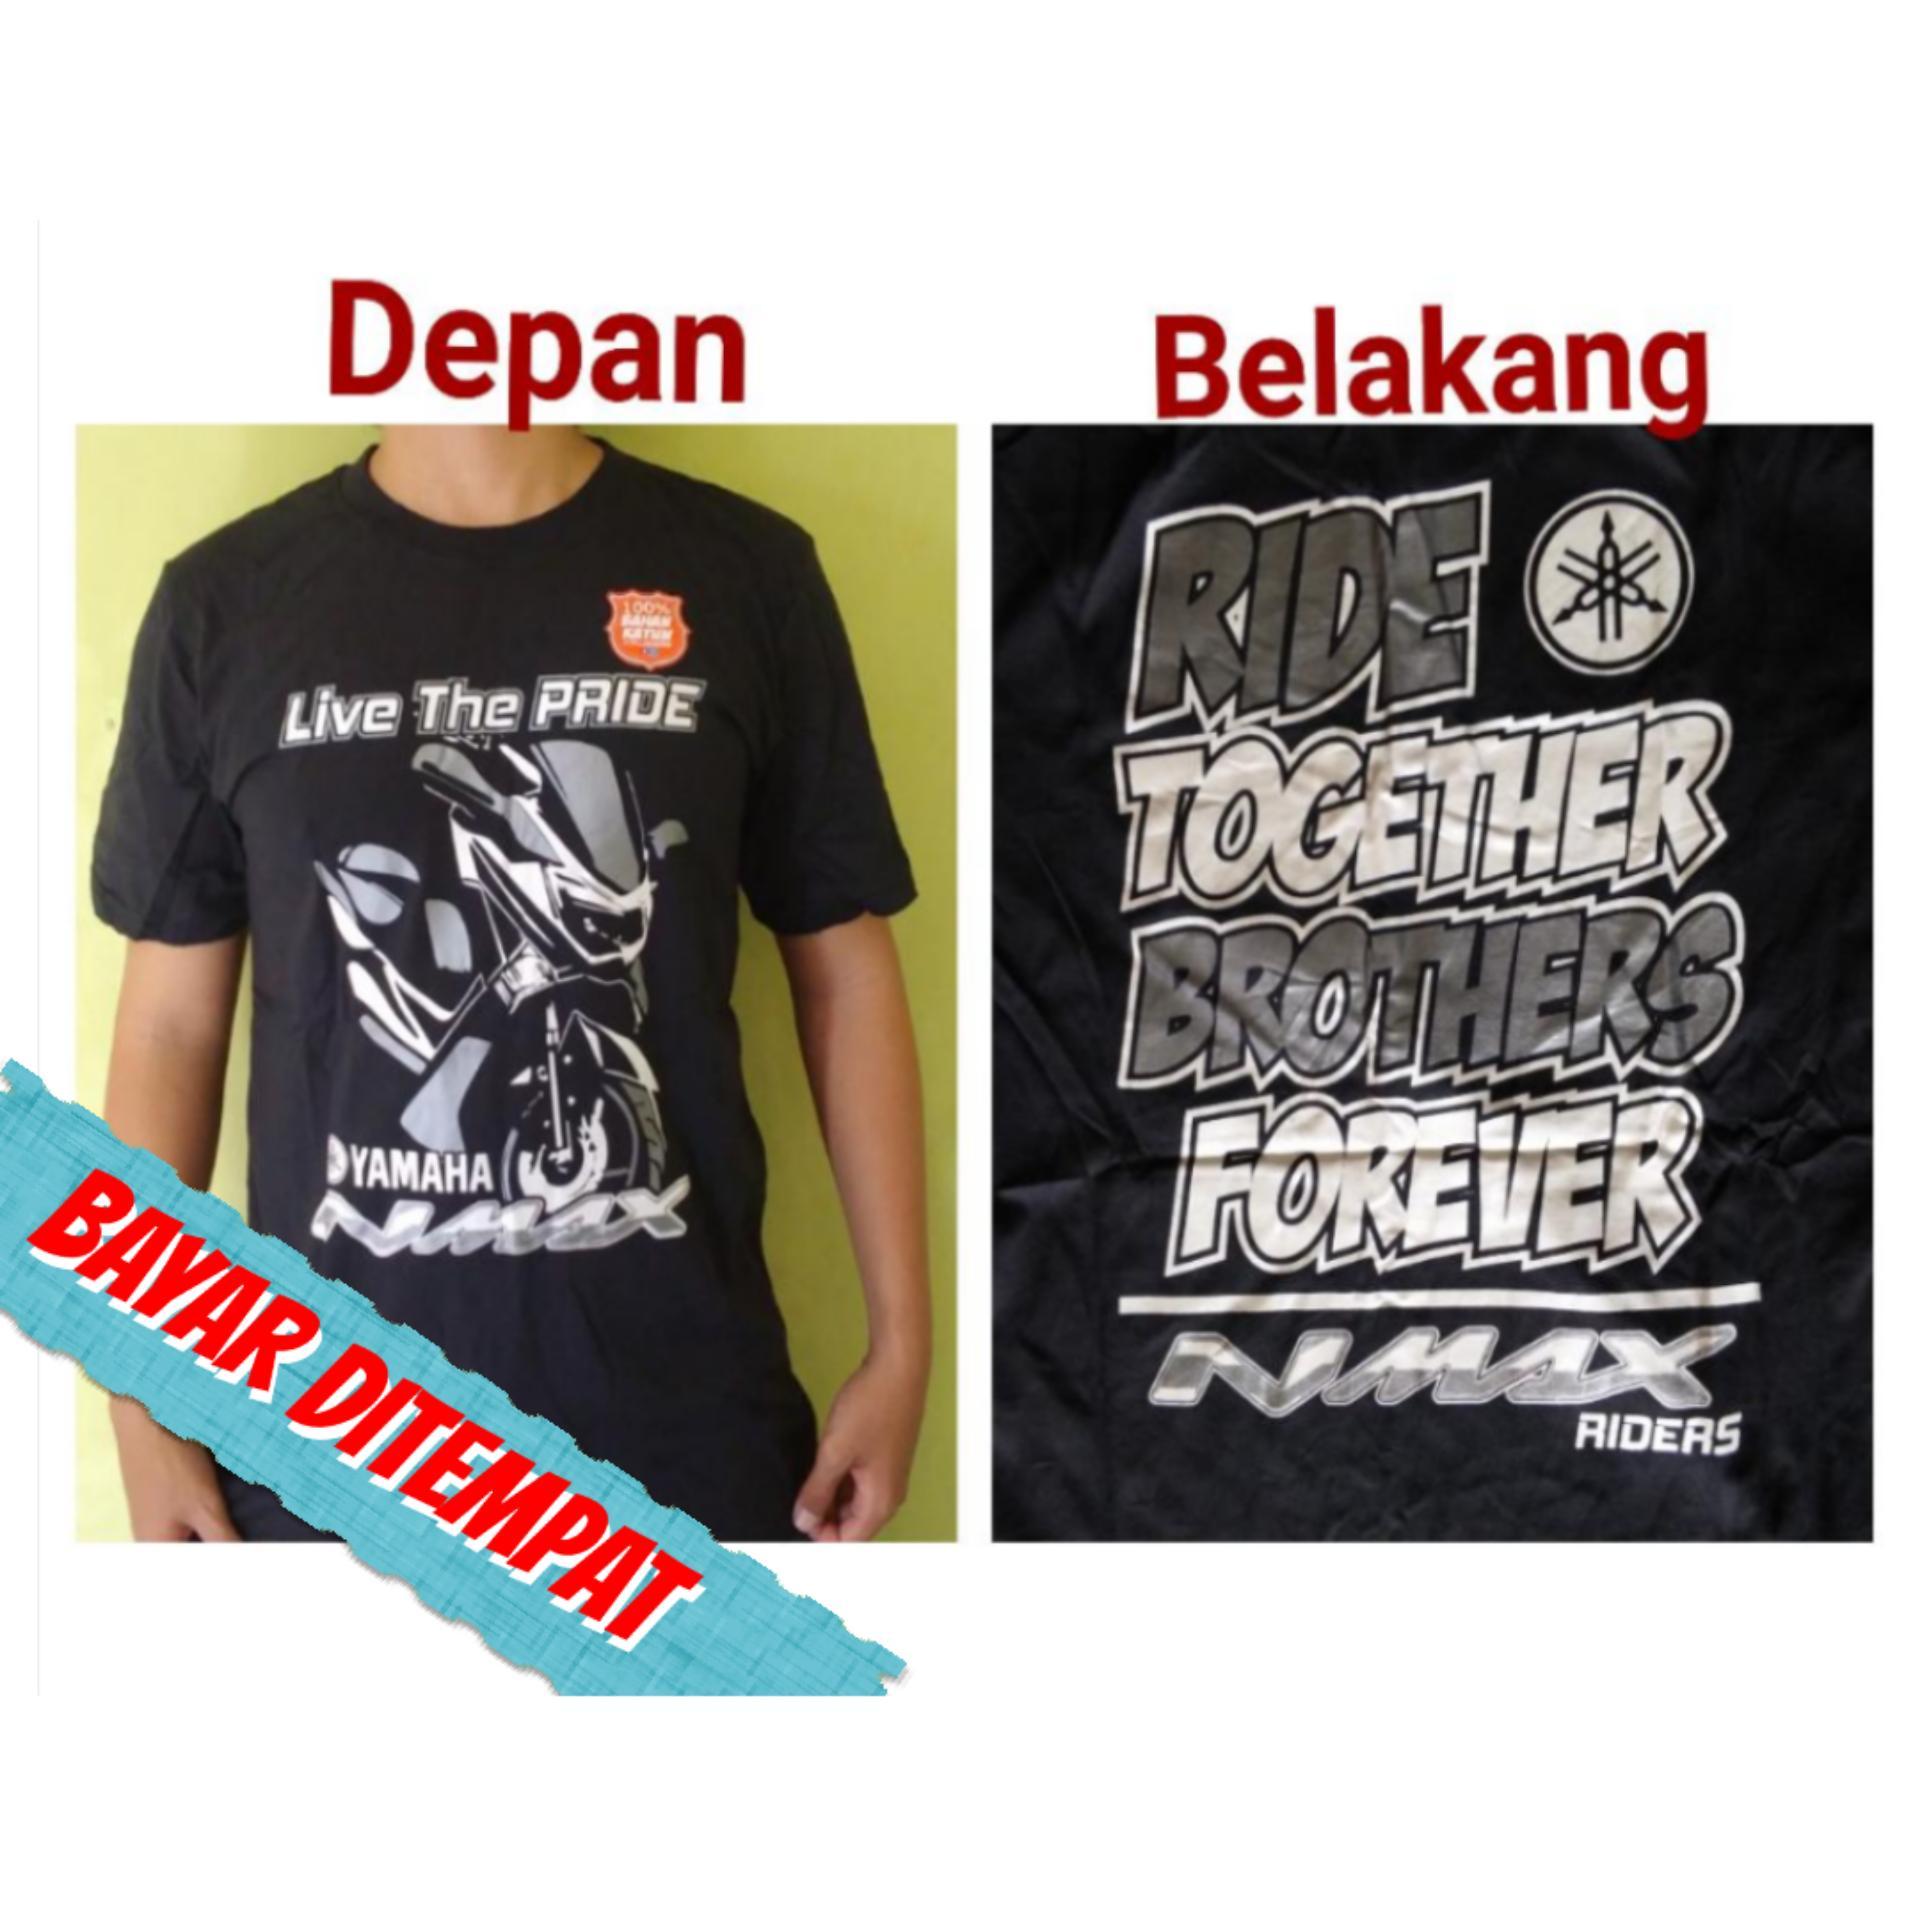 Fardhanshop - T-shirt / kaos / baju club / geng motor N-Max - Ride together brothers Forever